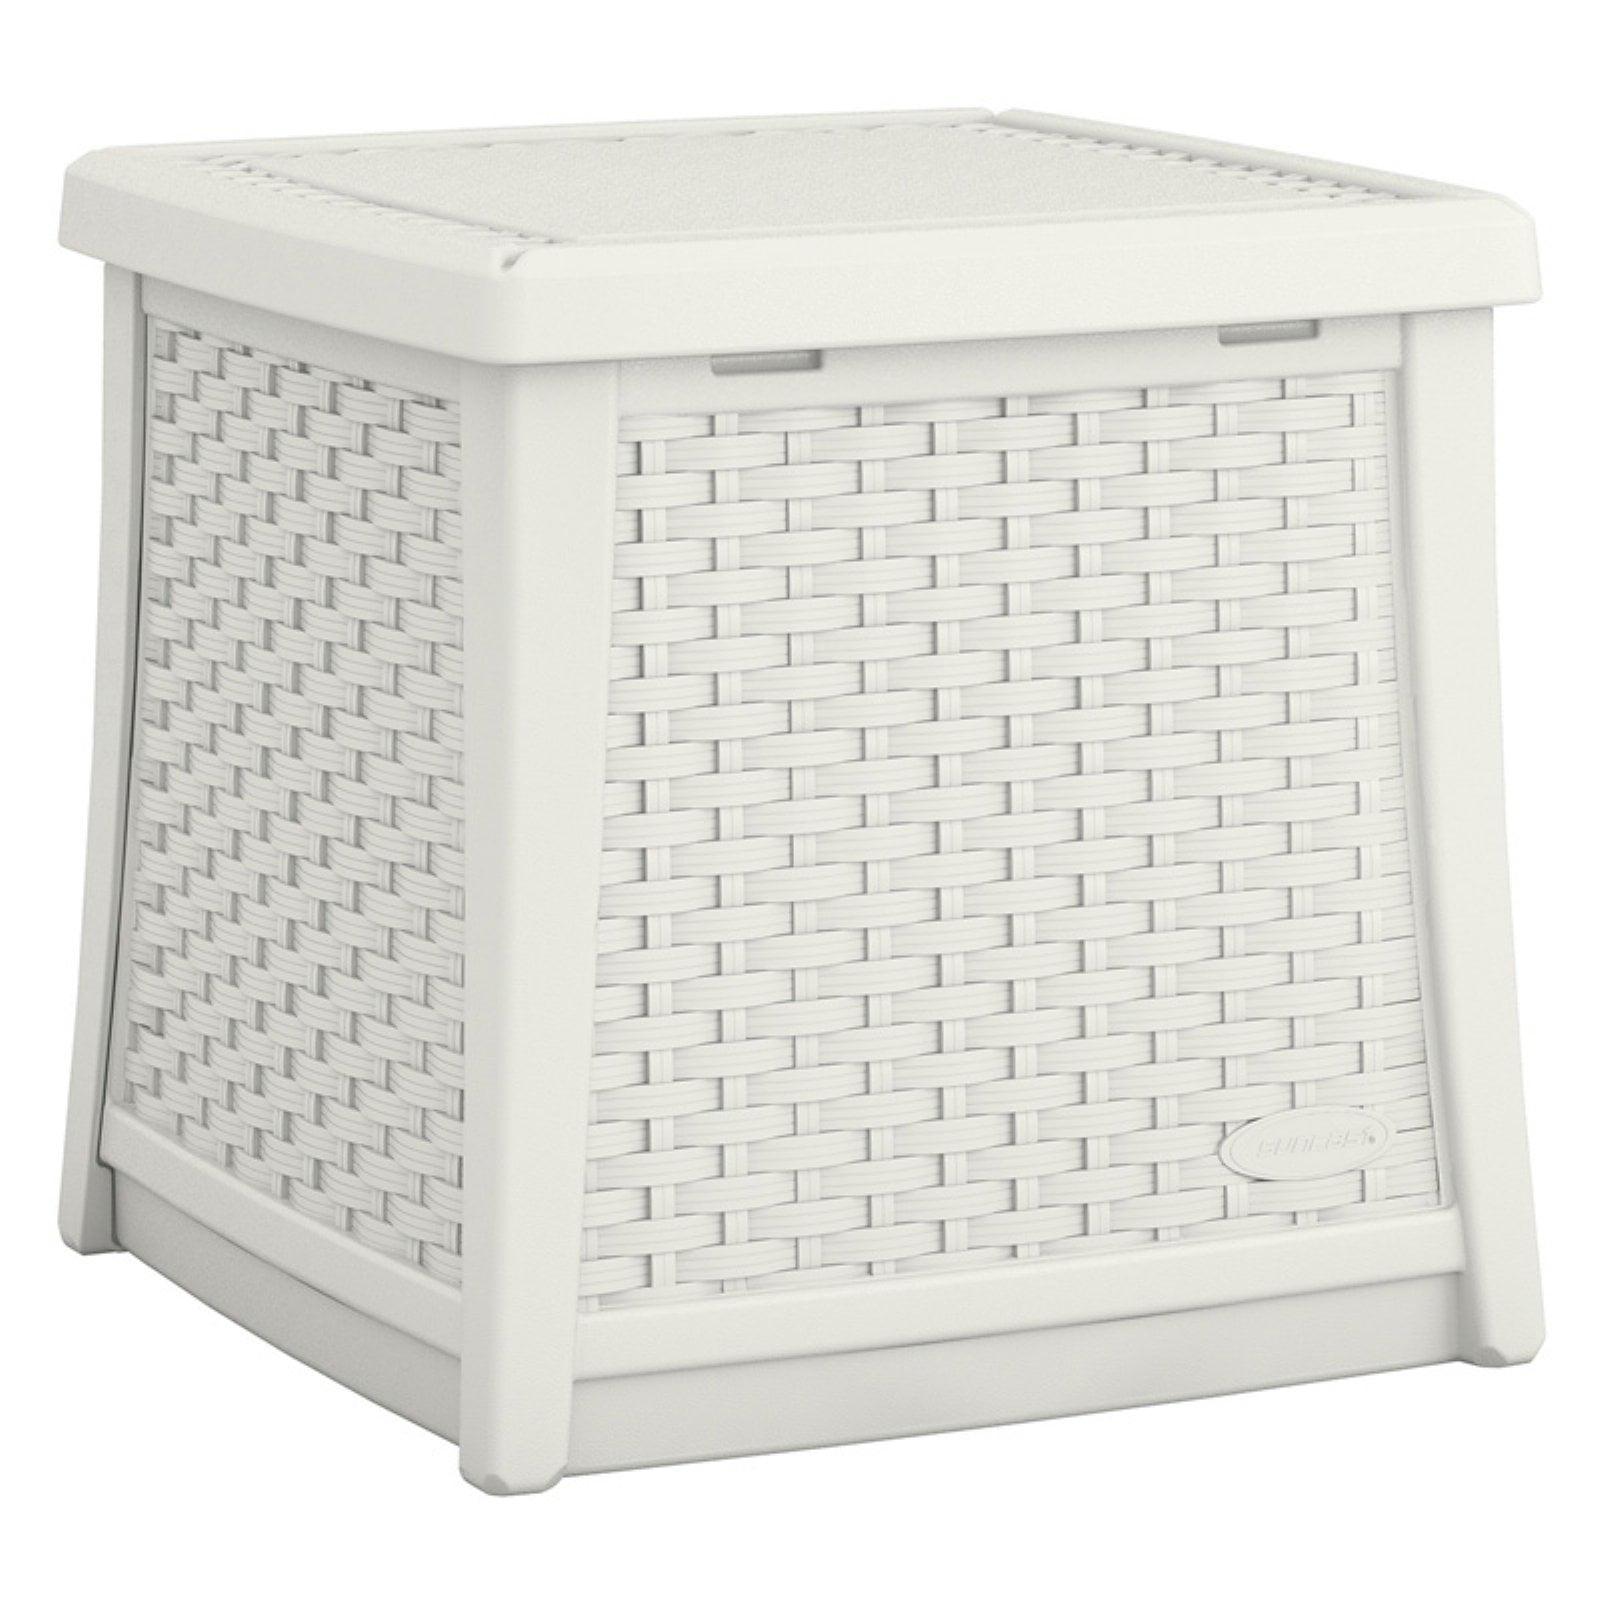 Suncast ELEMENTS End Table with Storage - White, BMDB1310W